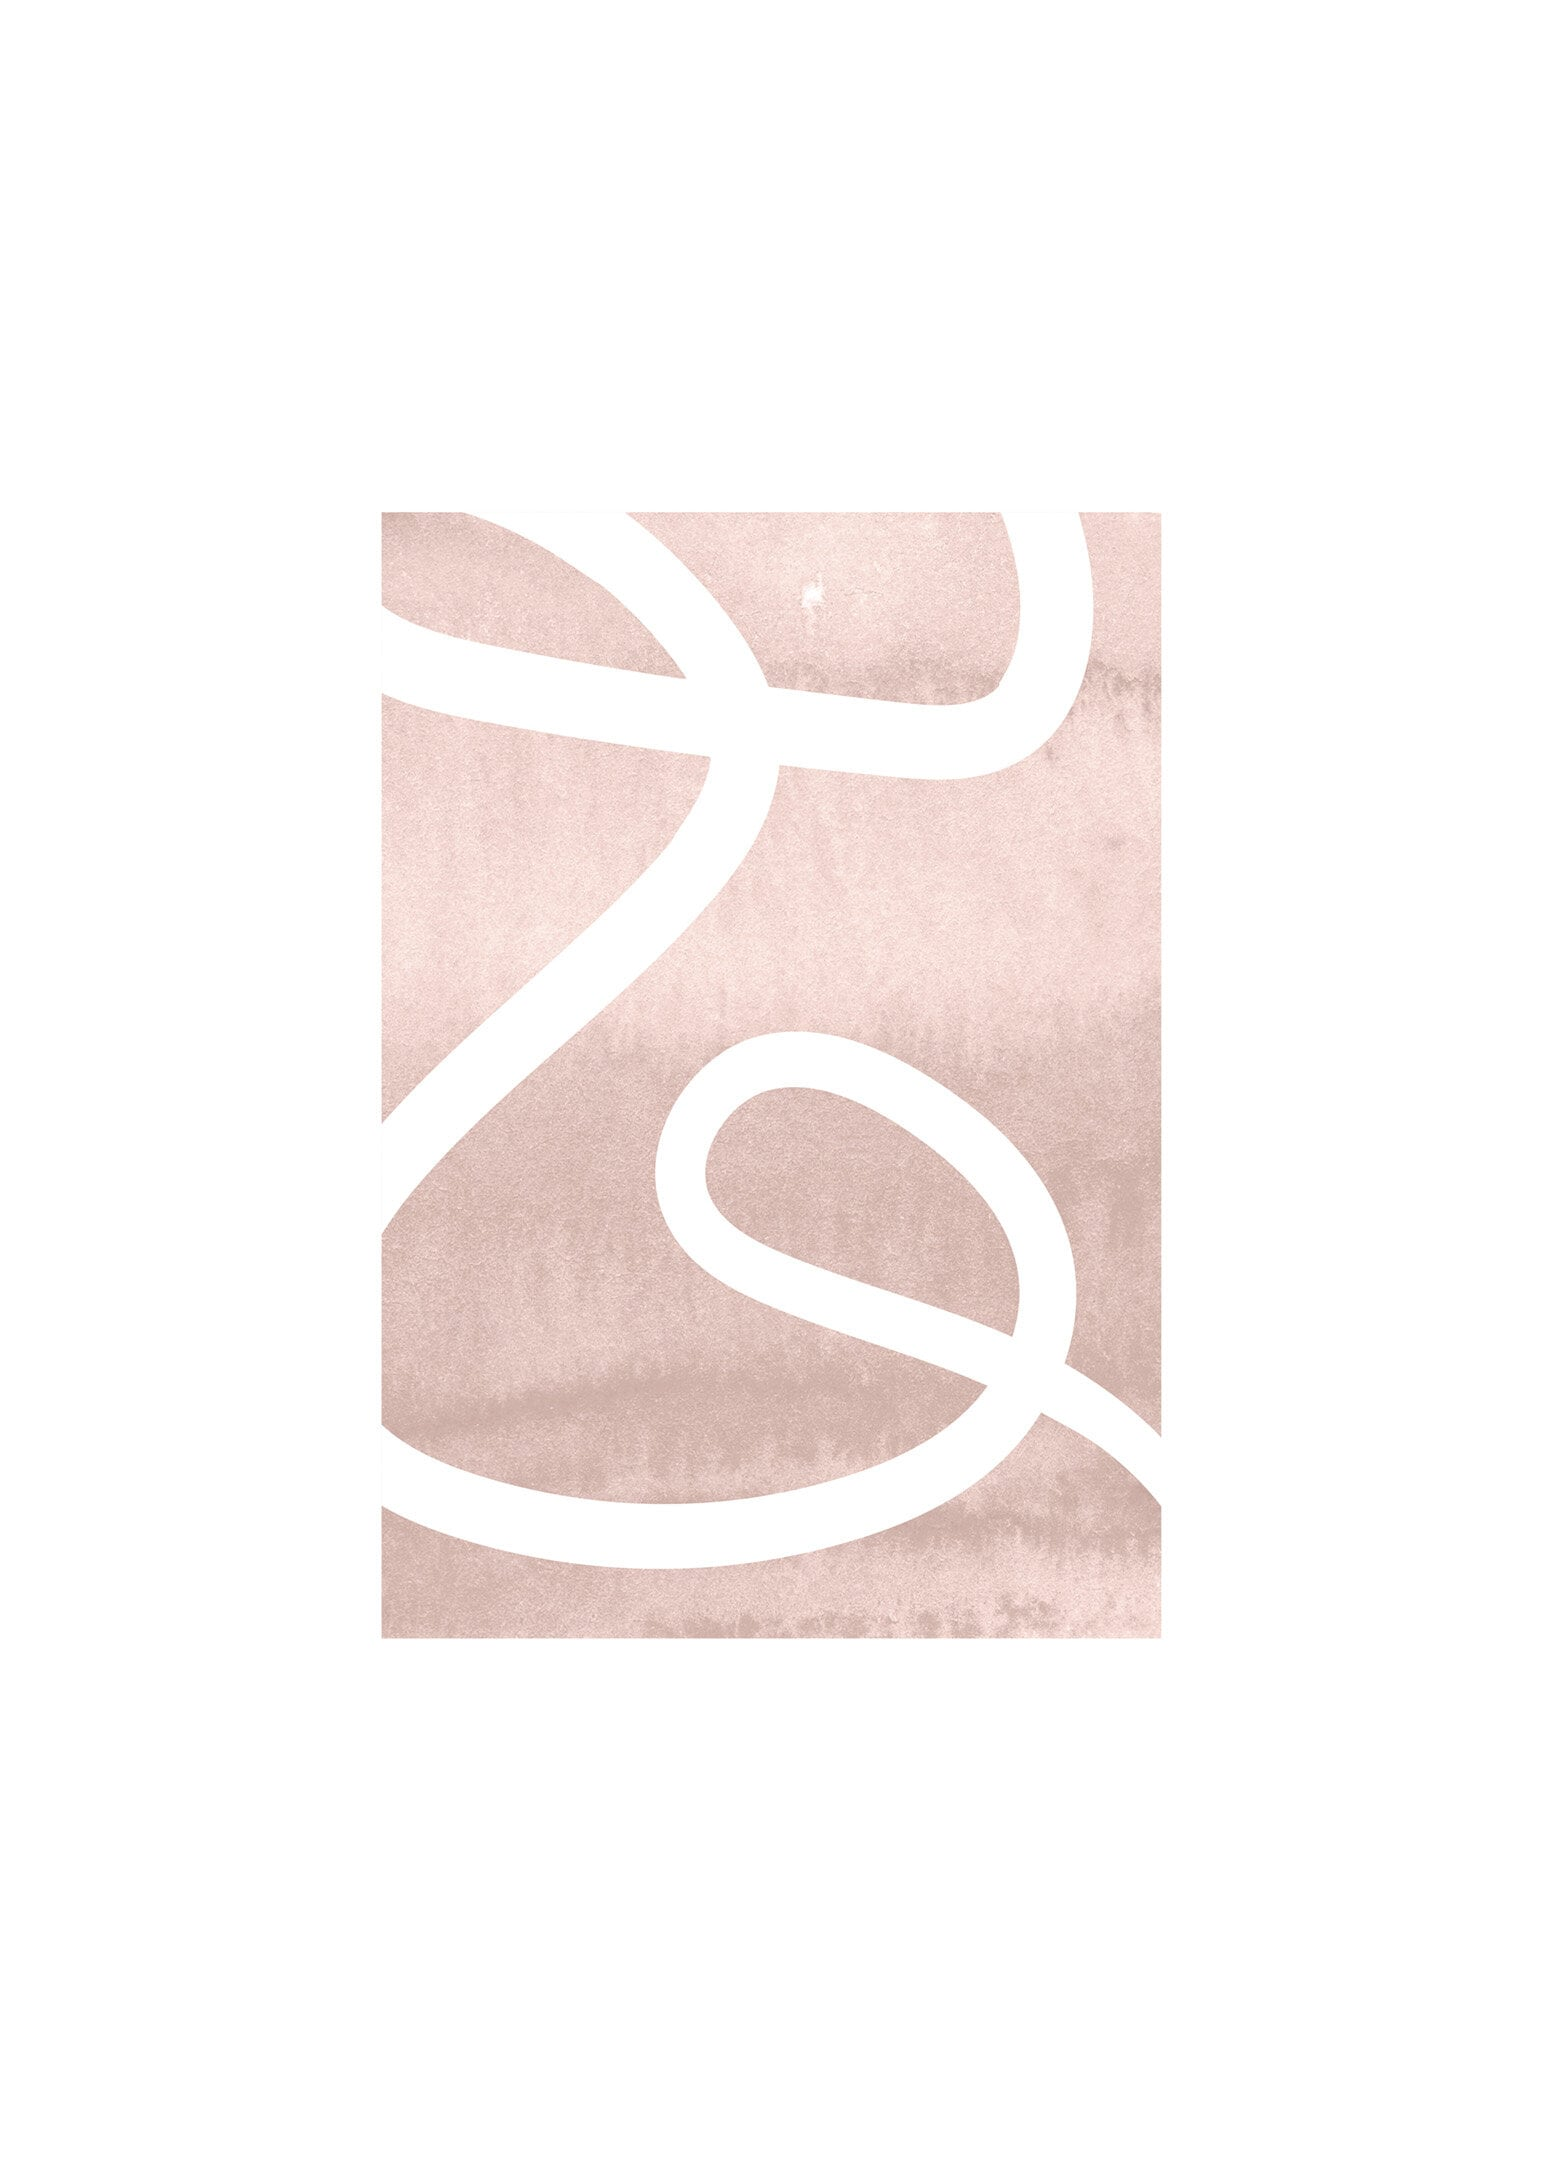 Virvla poster i rosa toner